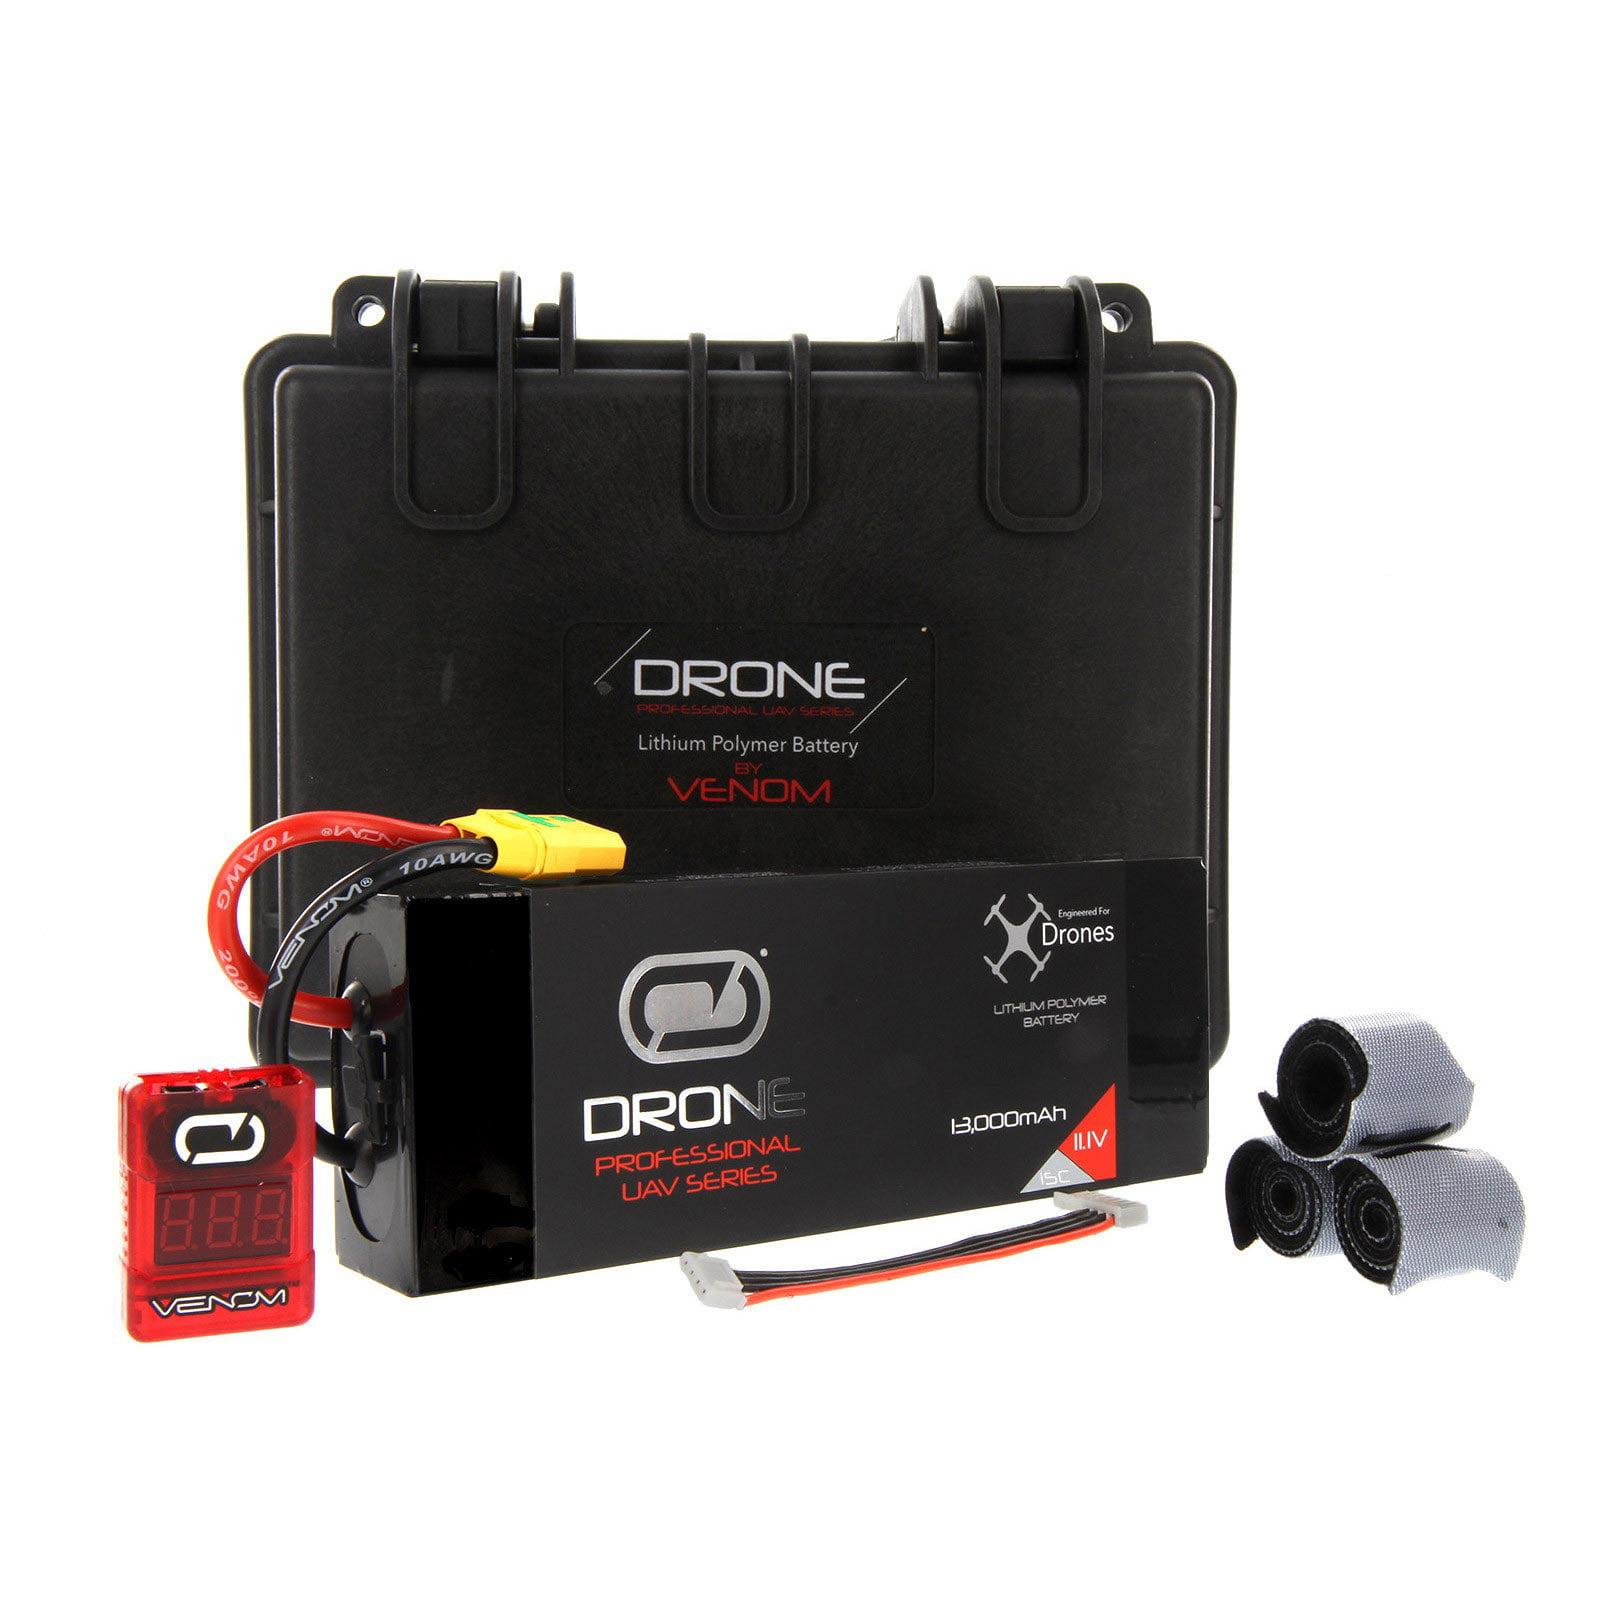 VENOM 13000mAh 3S 11.1V Drone Professional High Capacity Battery, 15C LiPo with XT90-S Plug